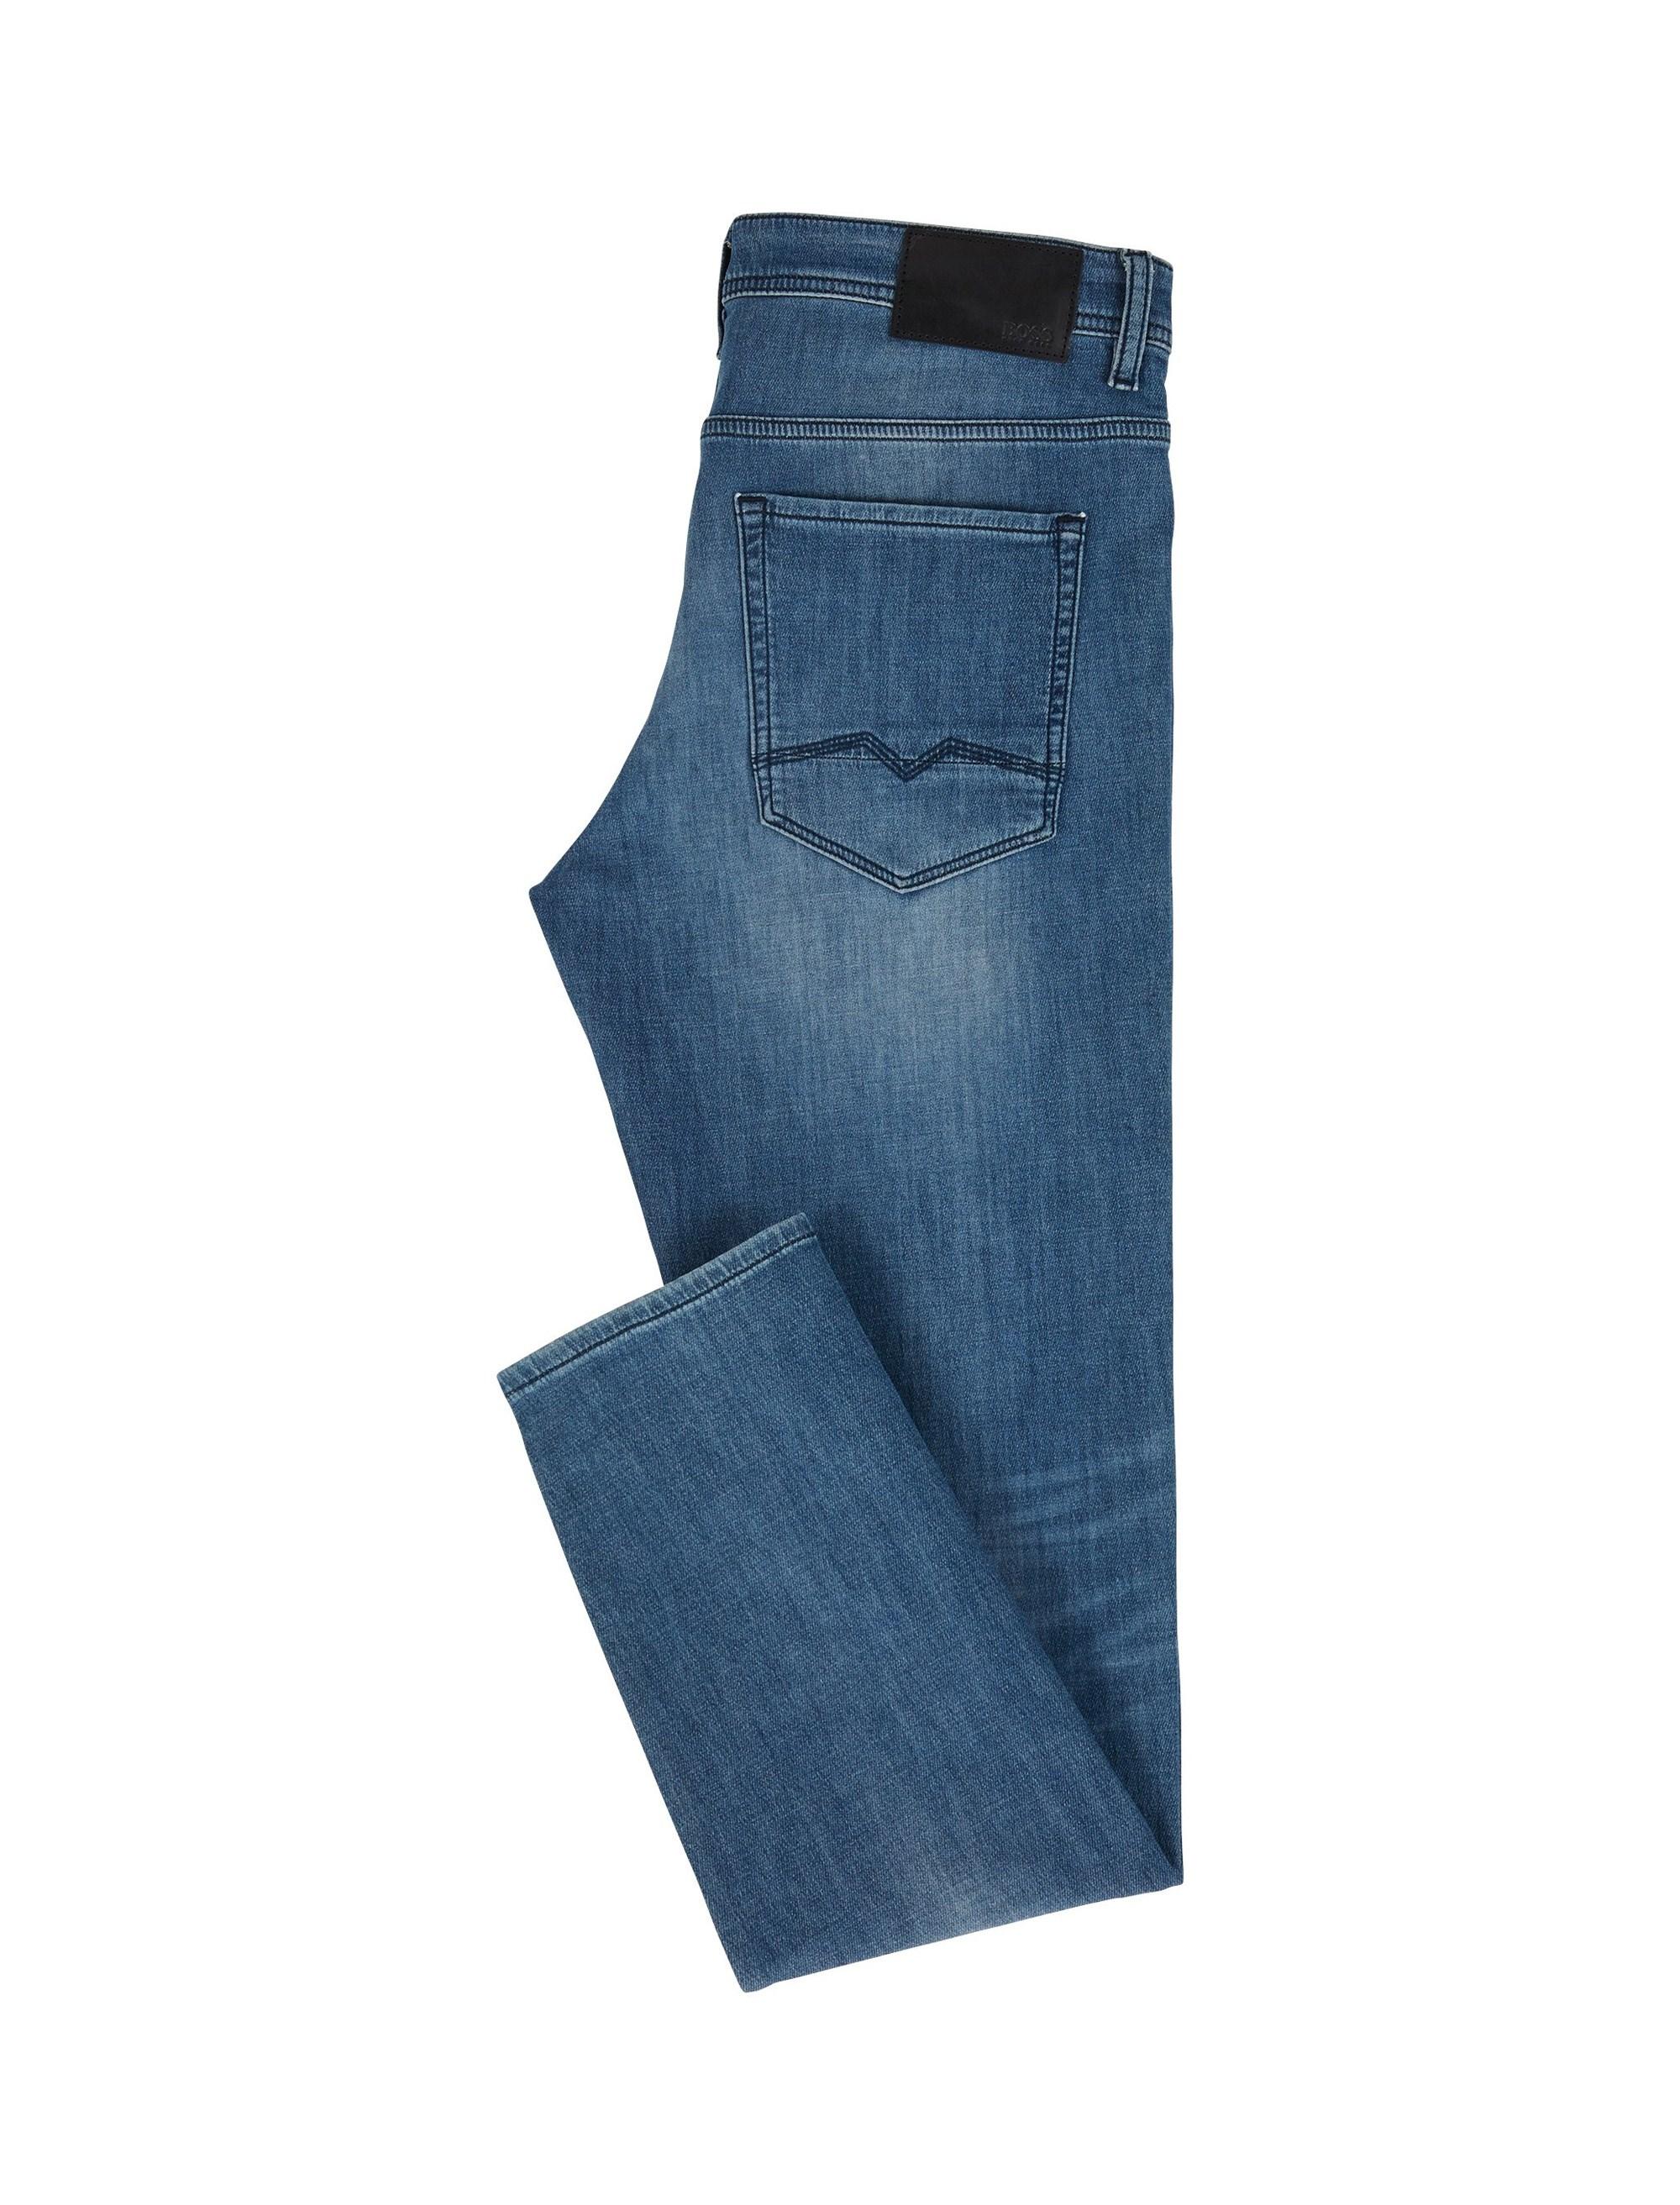 شلوار جین راسته مردانه Orange90-P SUAVE - باس اورنج - آبي تيره - 5